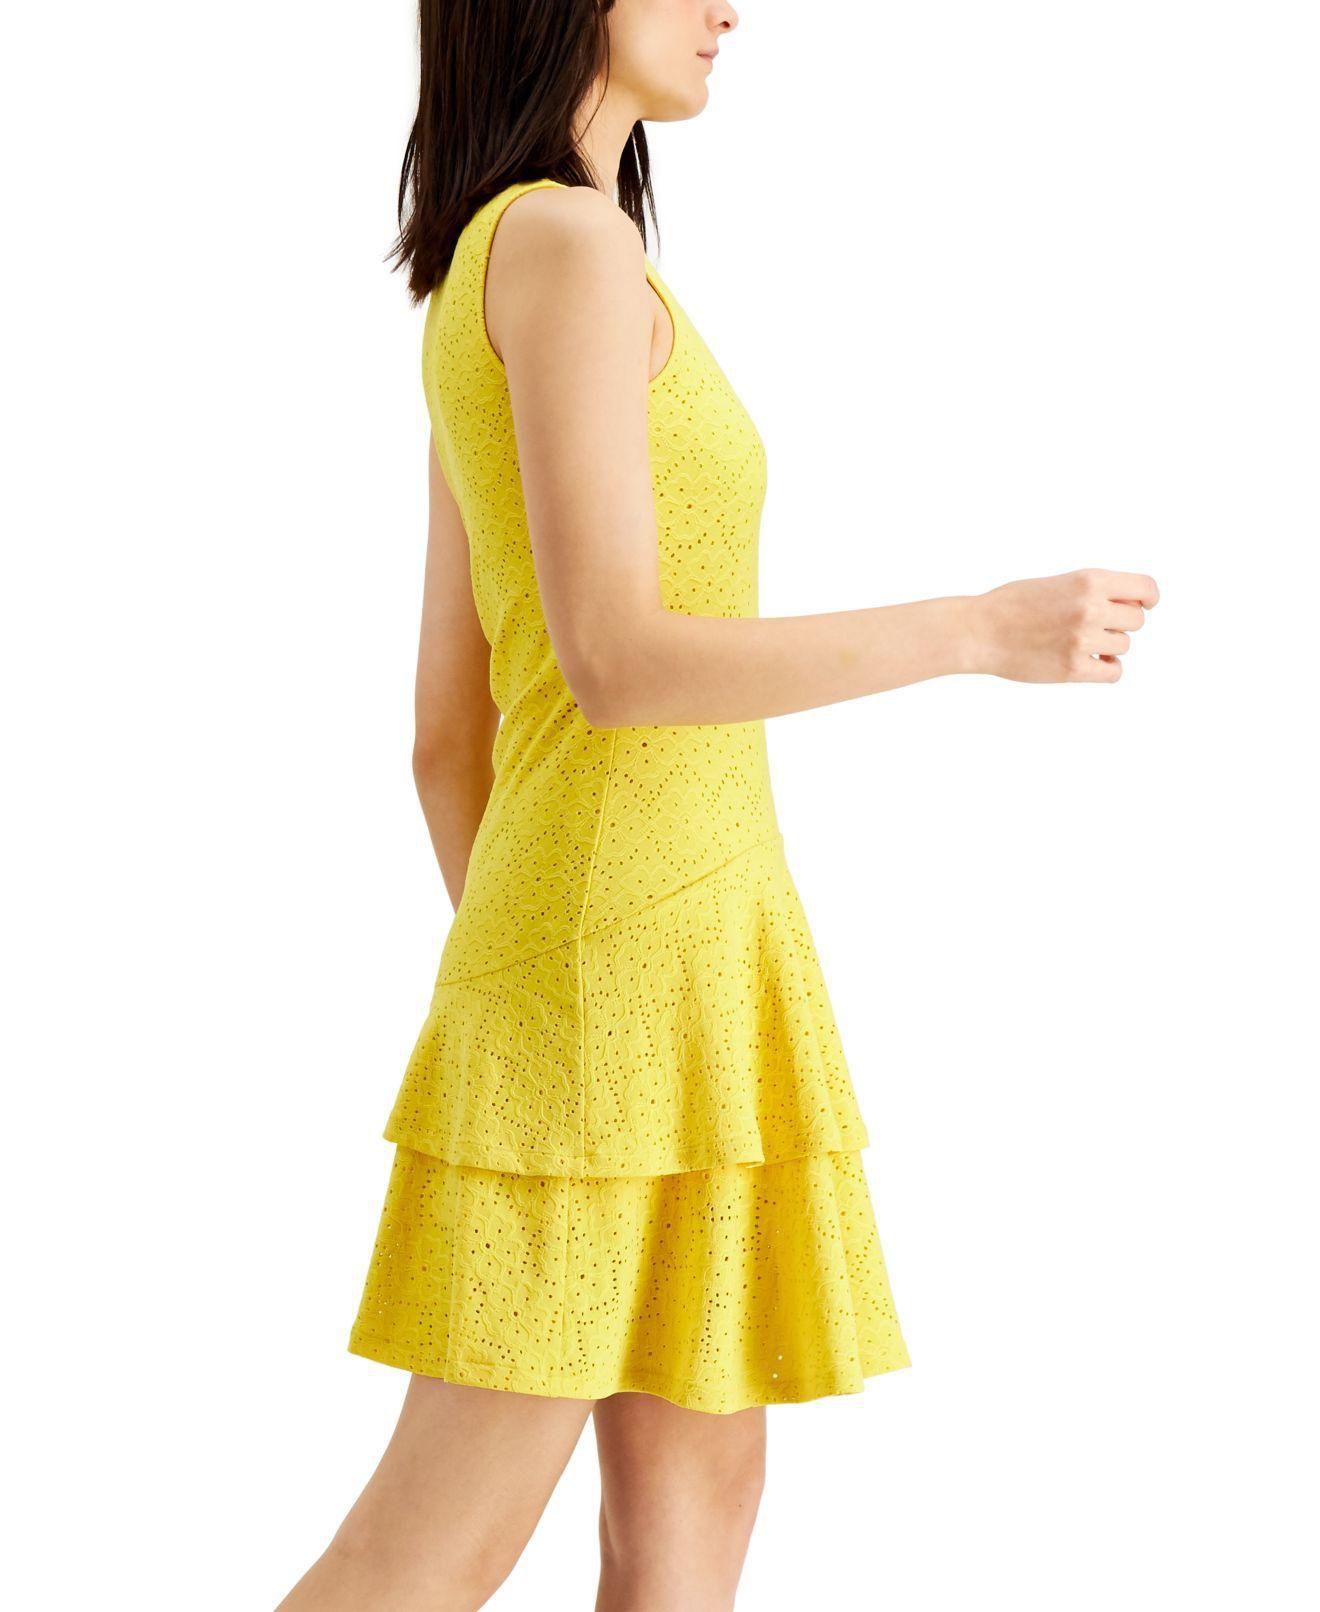 MICHAEL Michael Kors Women's Dress Bright Yellow Size Large L A-Line